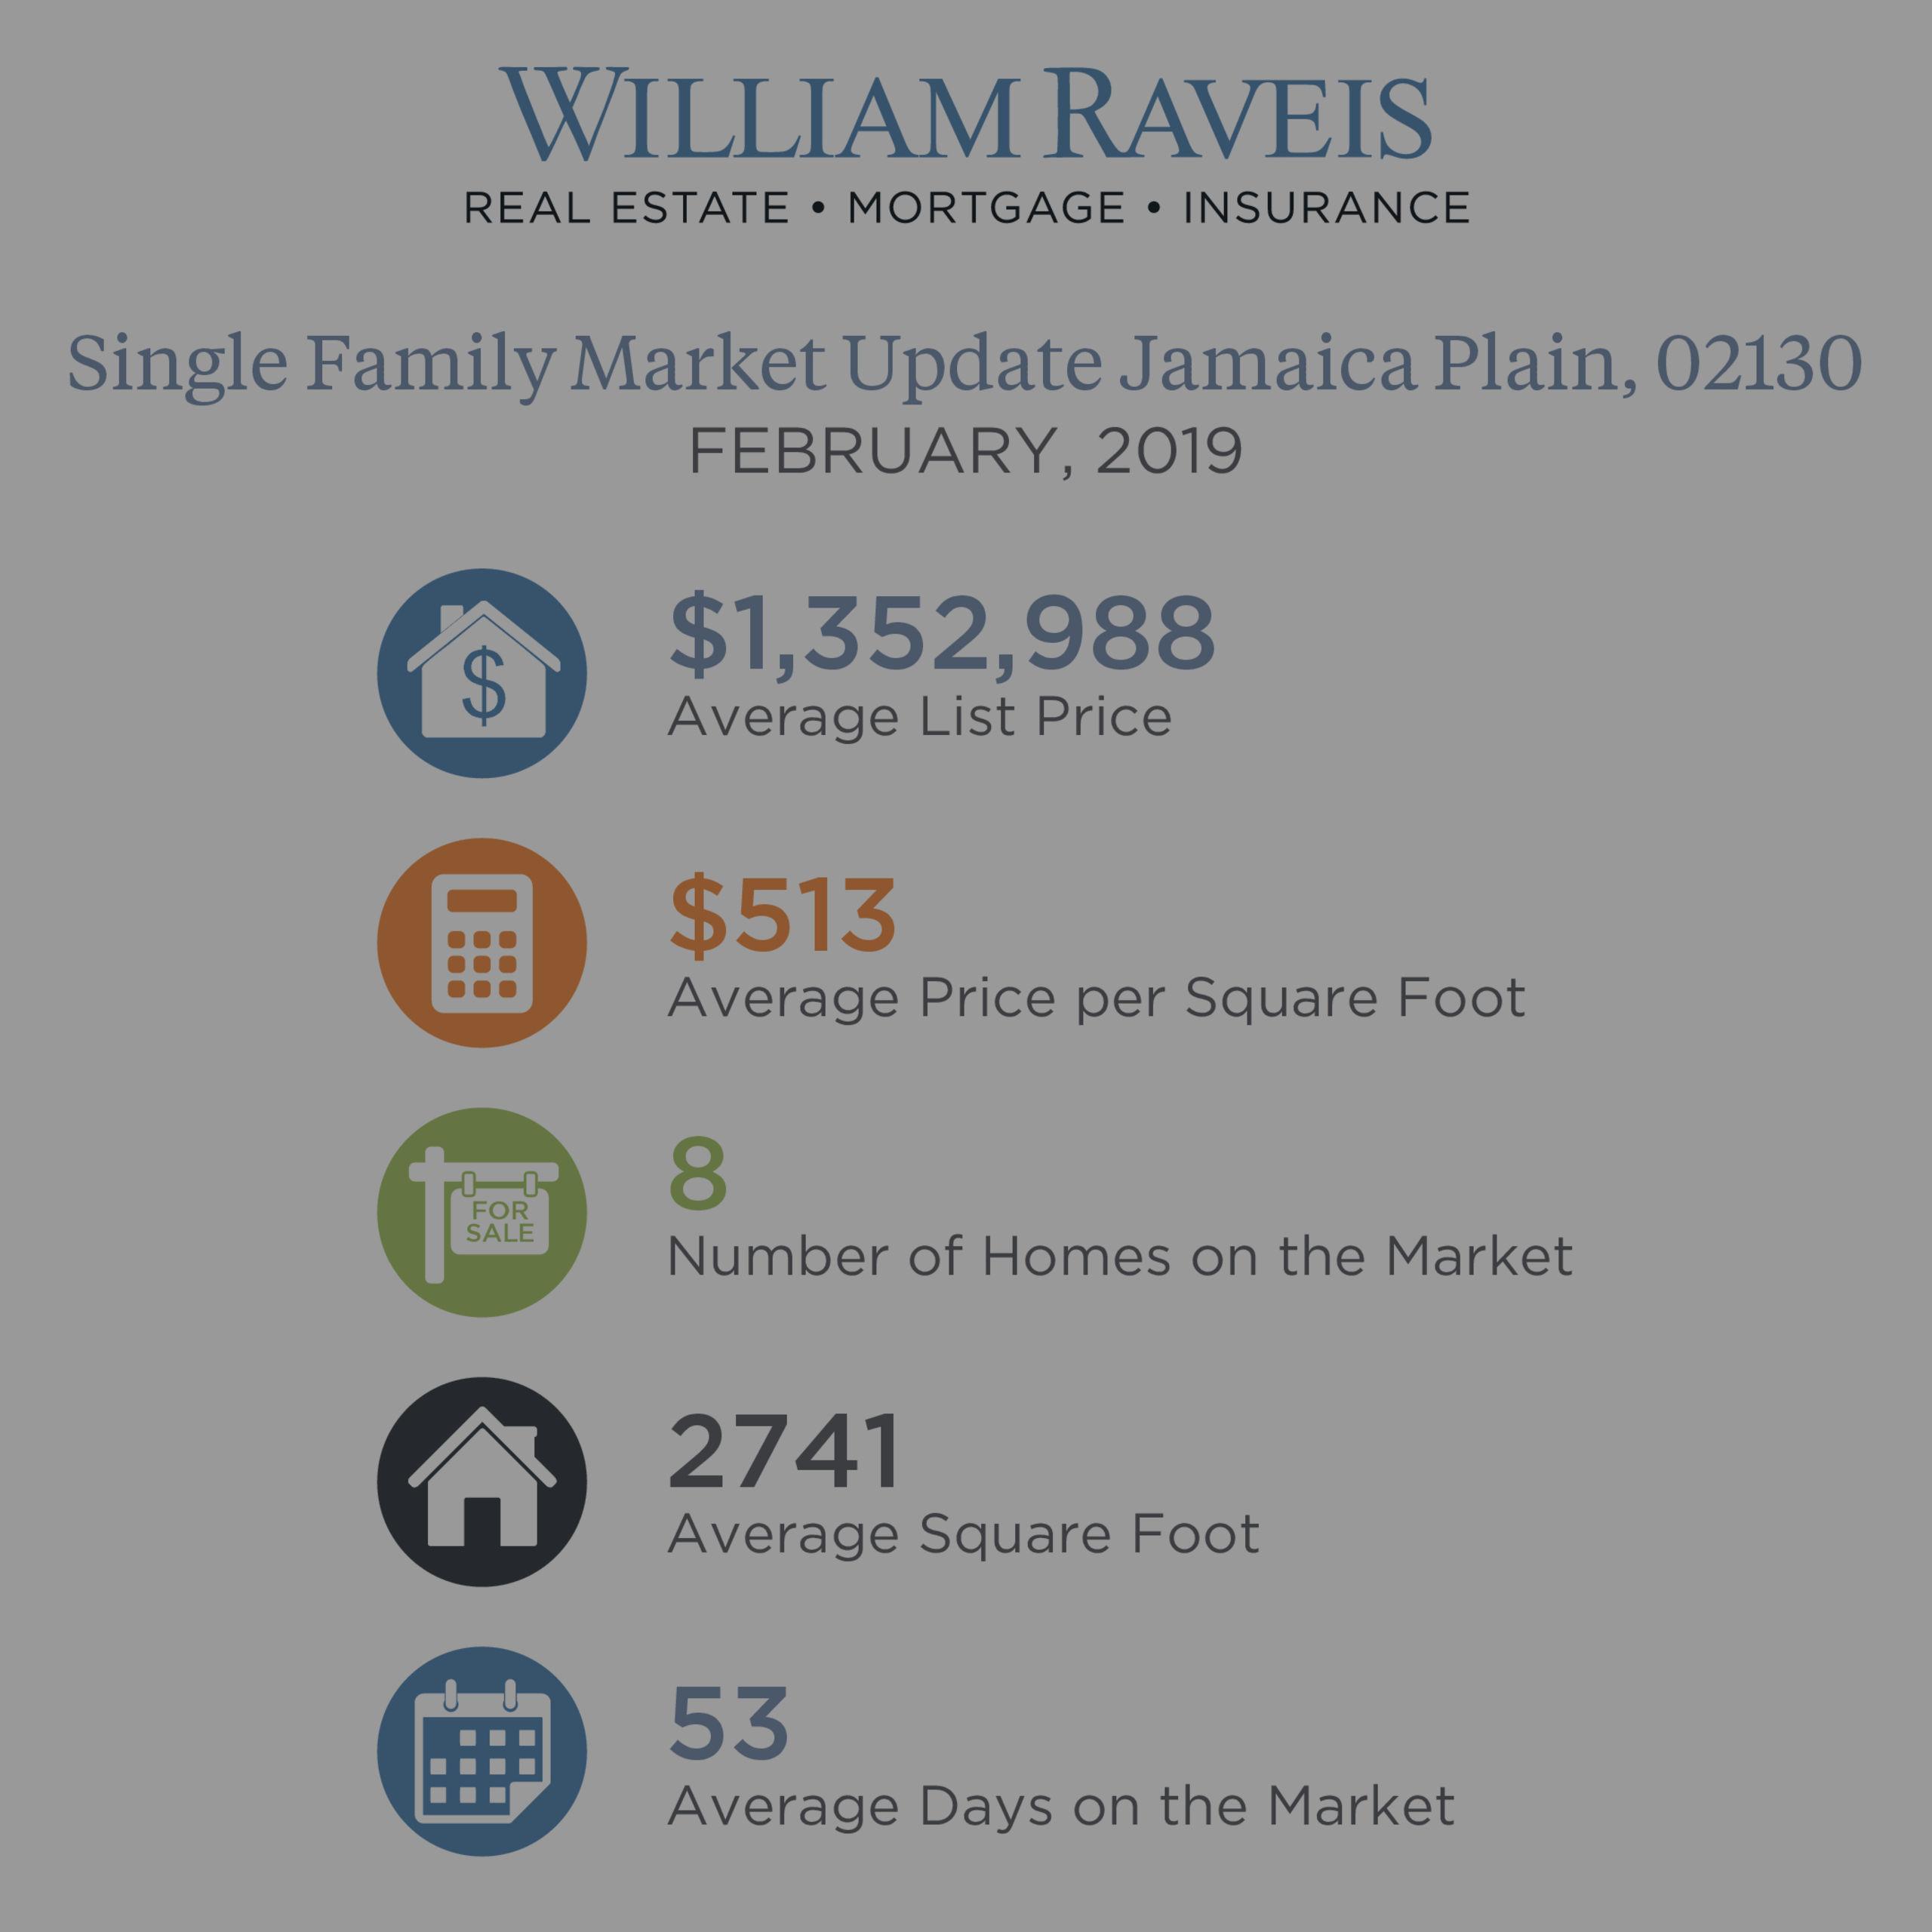 Jamaica Plain Single Family & Condominium Housing Market Update February 2019